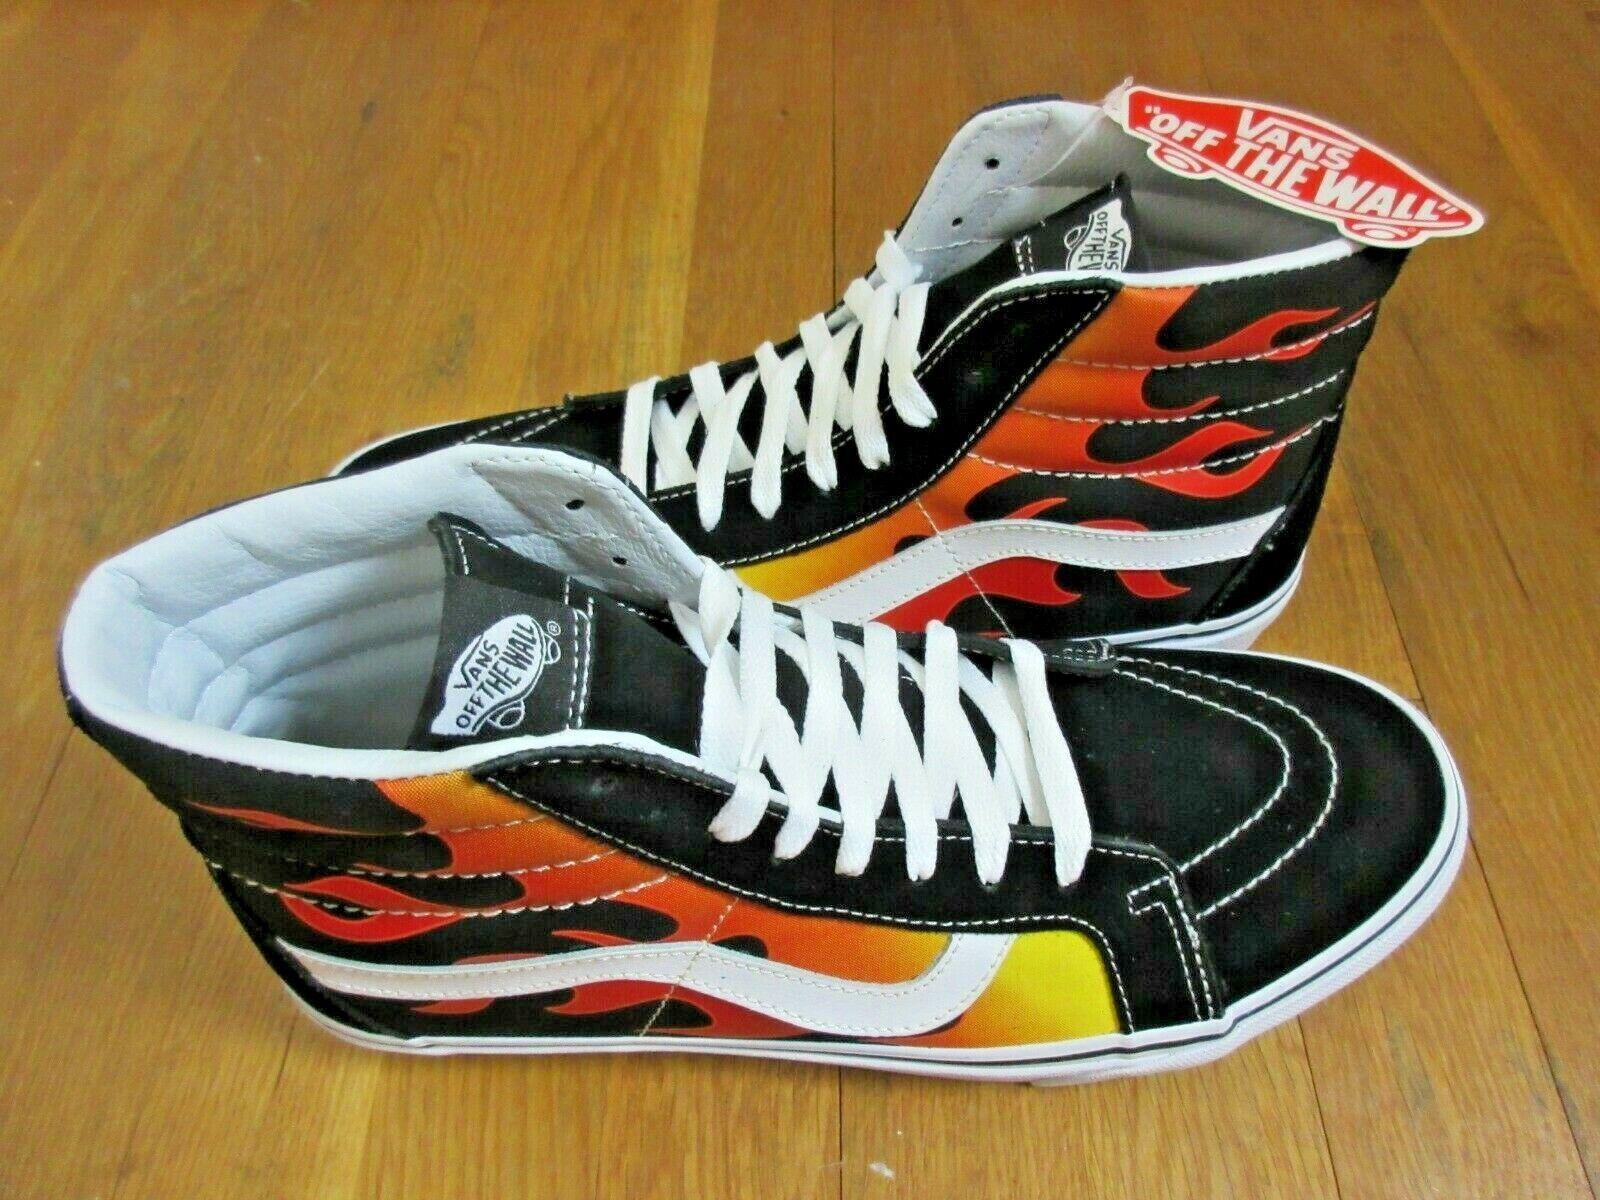 Vans Mens Sk8 Hi Reissue Flame Black Orange True White Skate shoes Size 11.5